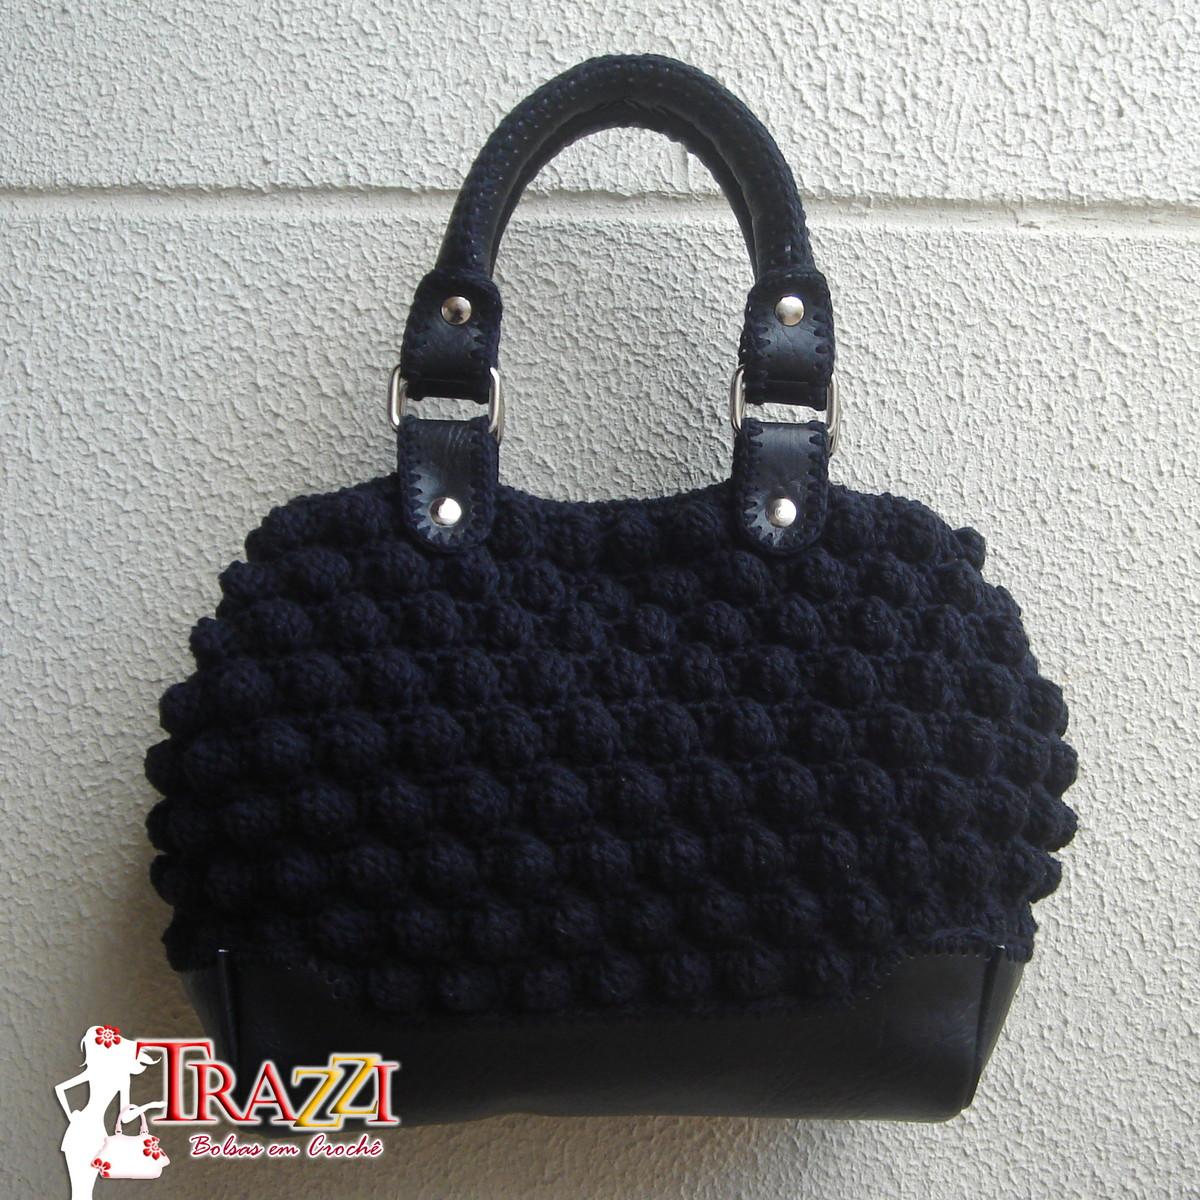 Bolsa D G Mini - Preta no Elo7   TRAZZI (B1F45) 20fcf49641